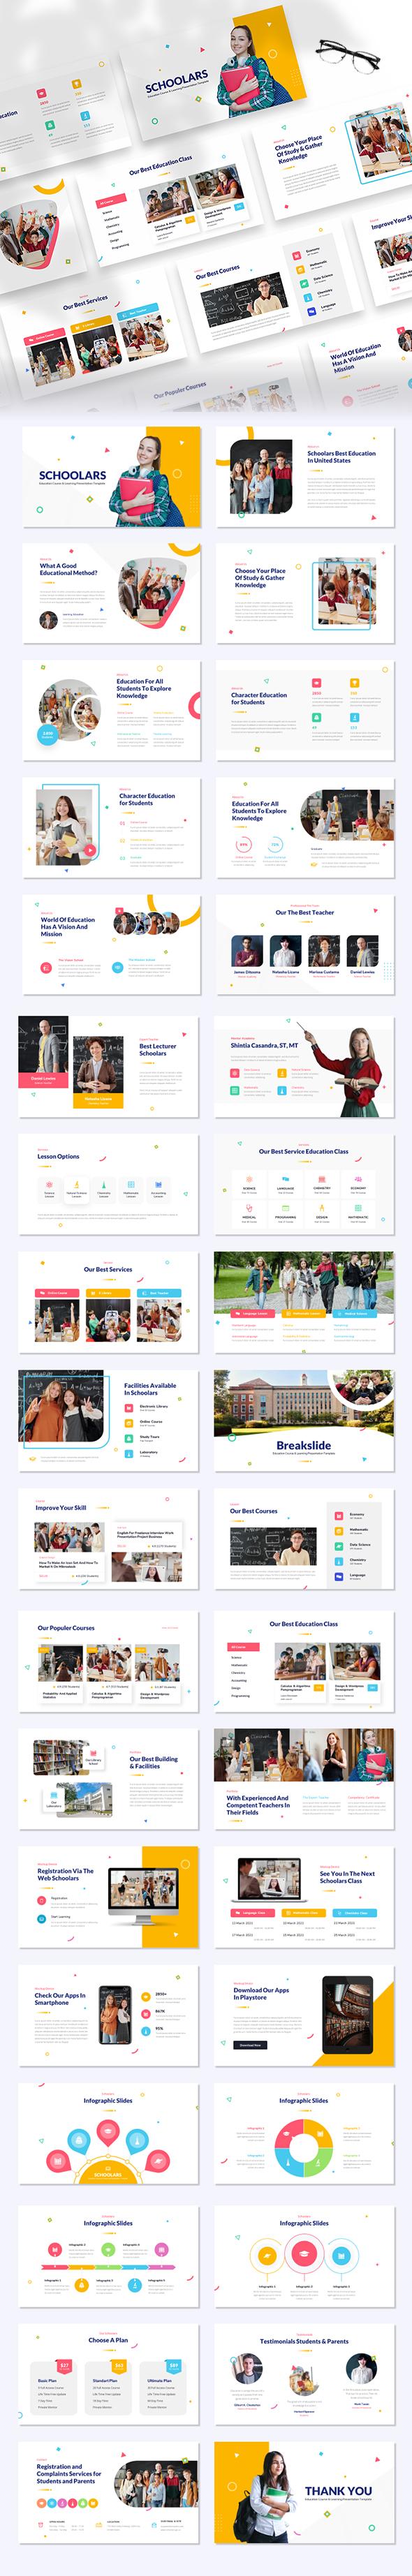 Schoolars – Education Course & Learning Google Slides Template